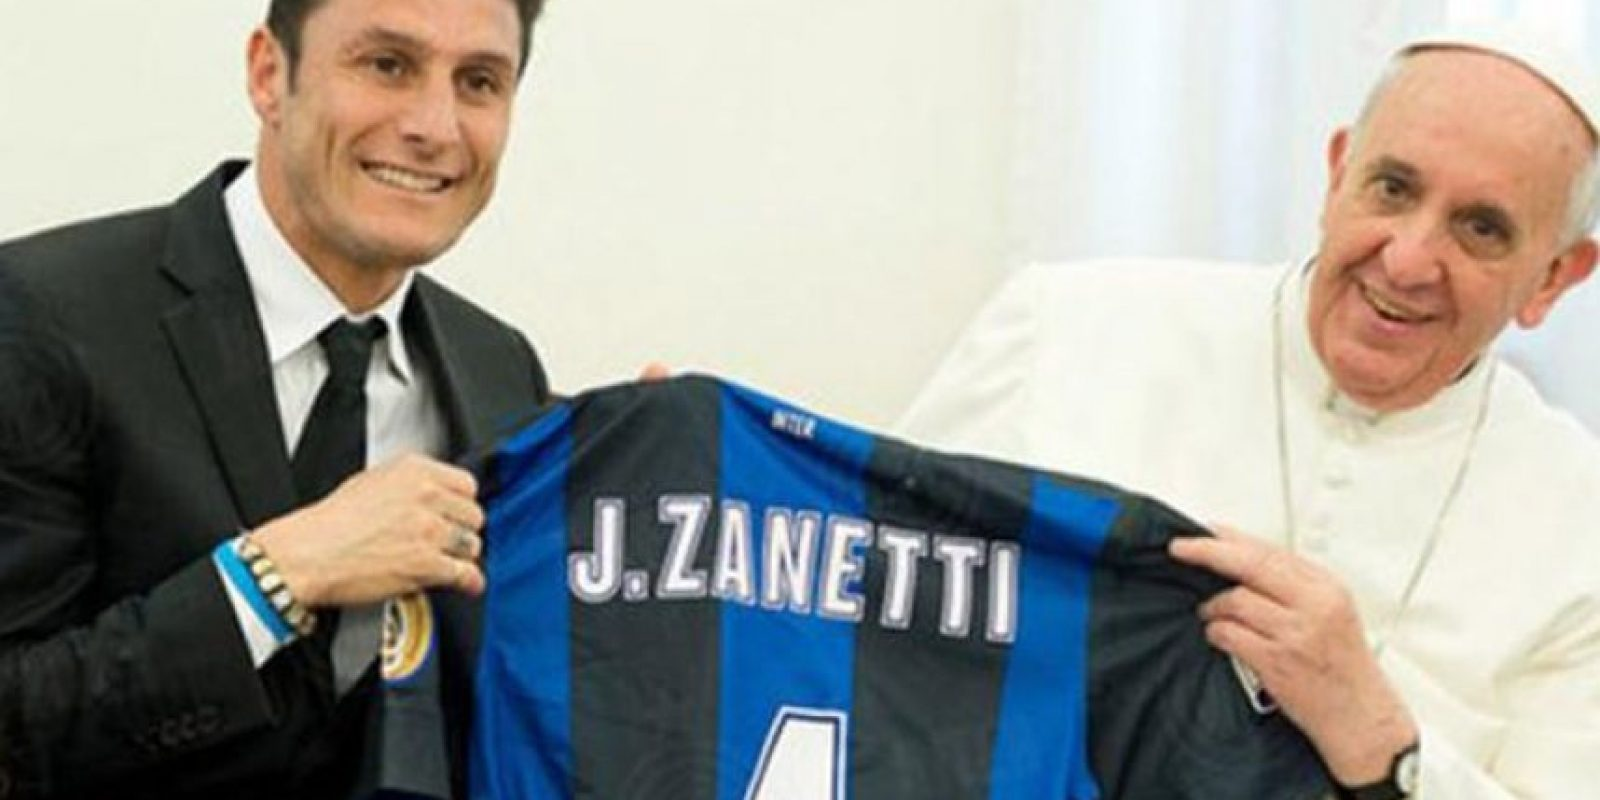 Fue visitado por su compatriota Javier Zanetti.